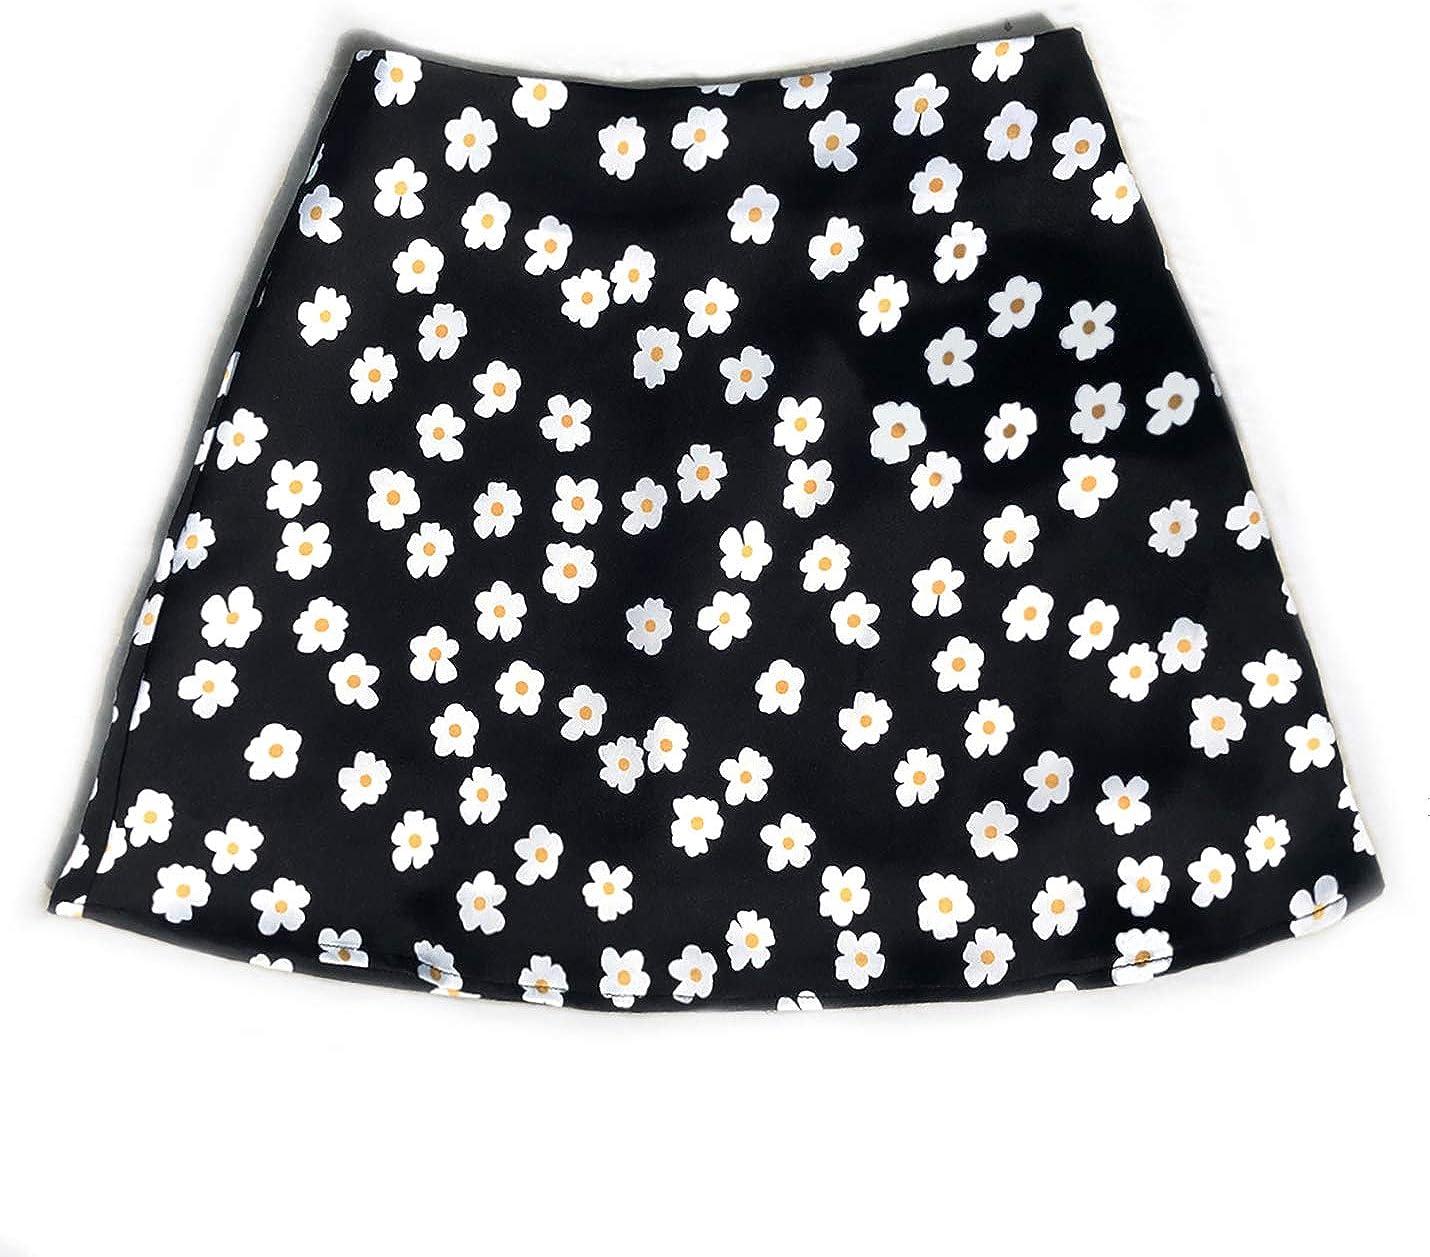 IKIIO Women's Casual Summer Cute Boho Floral Print High Waist Skirt Flared A Line Skirts